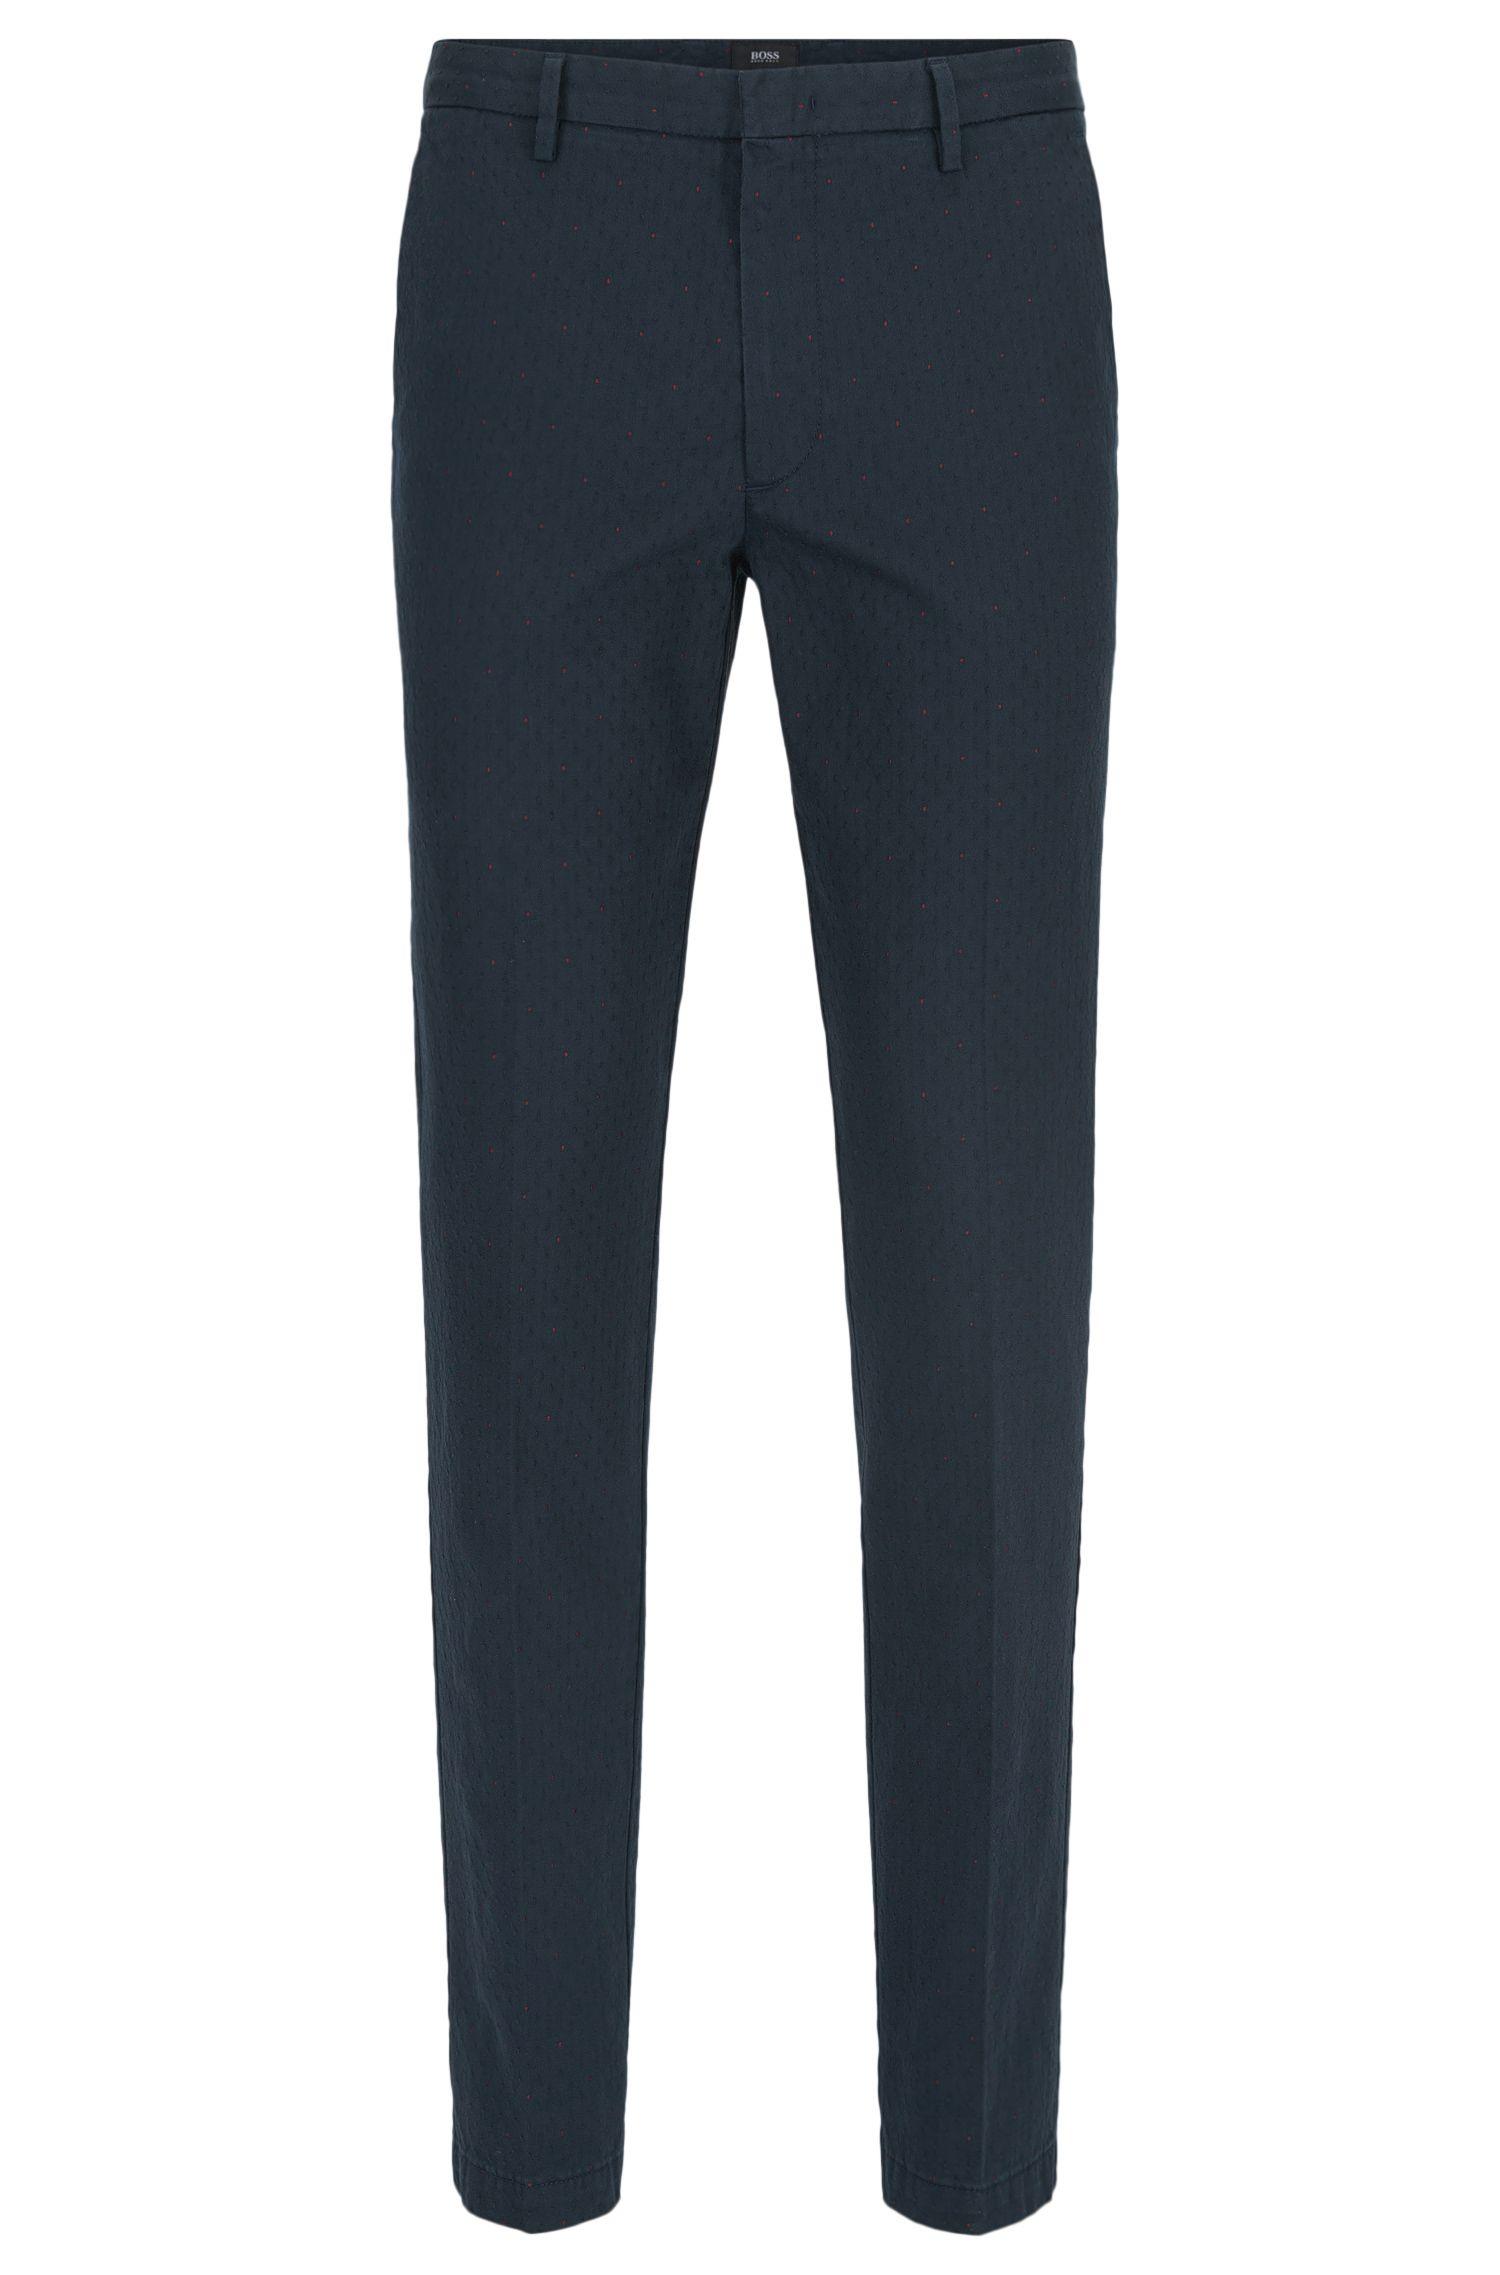 Dot Jacquard Stretch Cotton Pant, Slim Fit | Kaito W